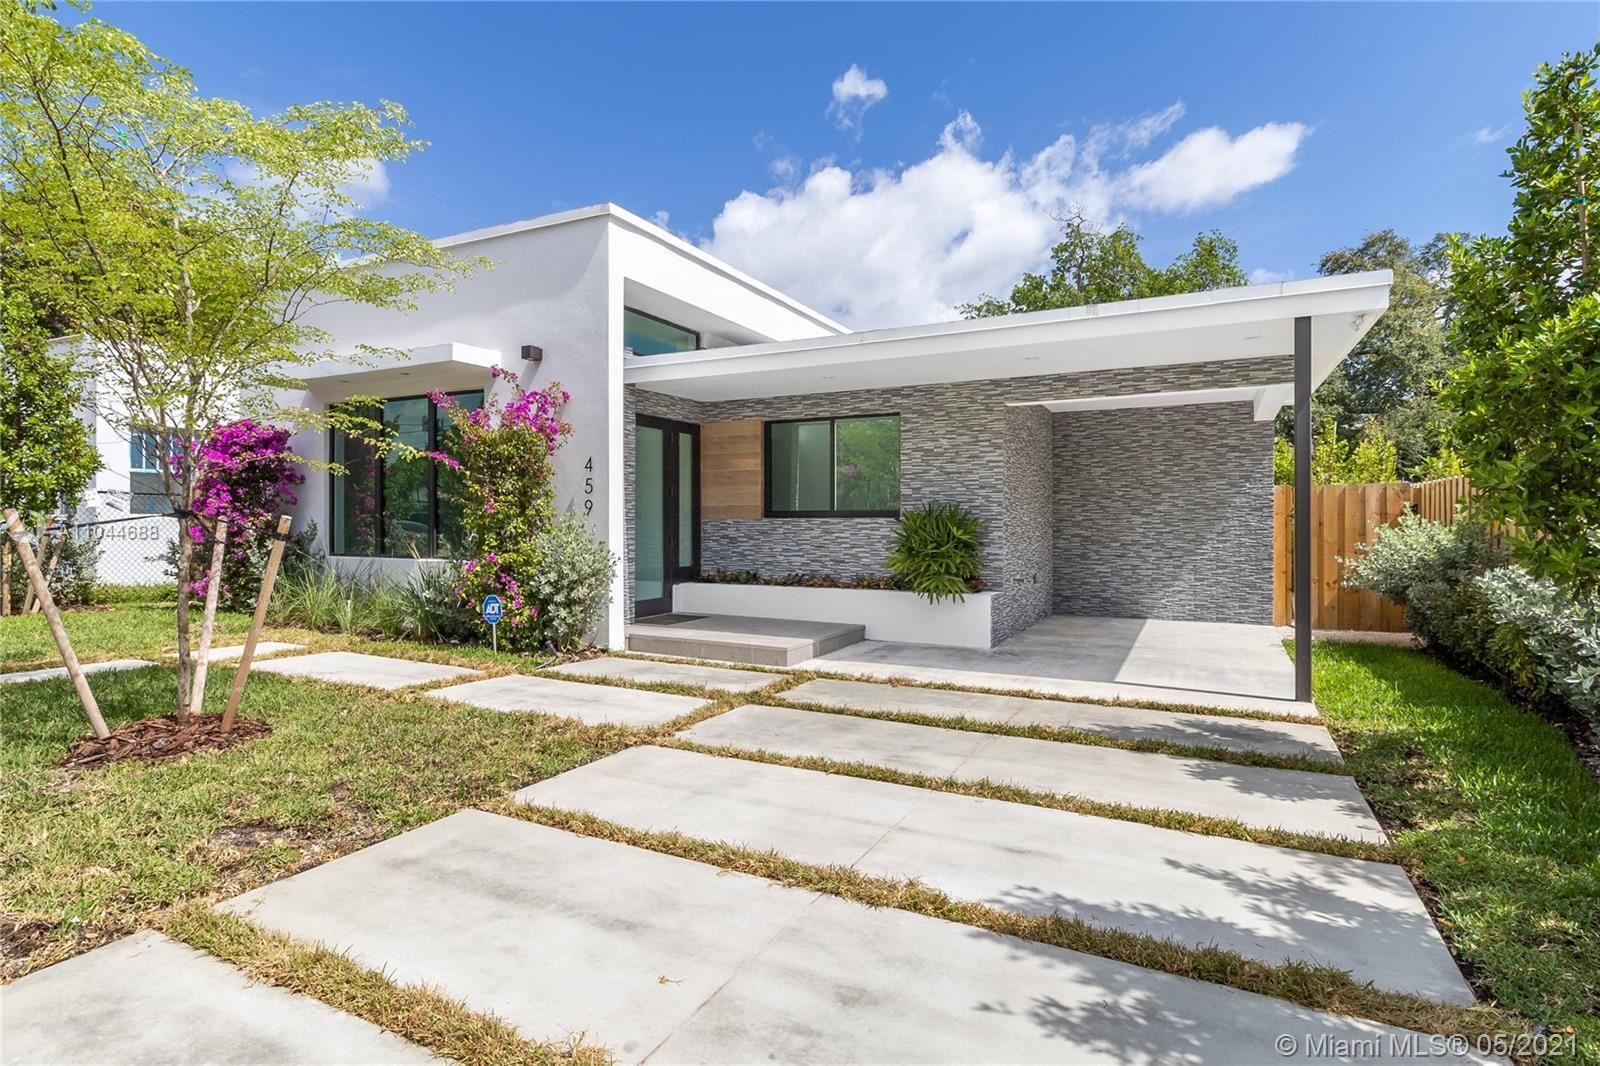 459 NE 63rd St, Miami, FL 33138 - #: A11044688